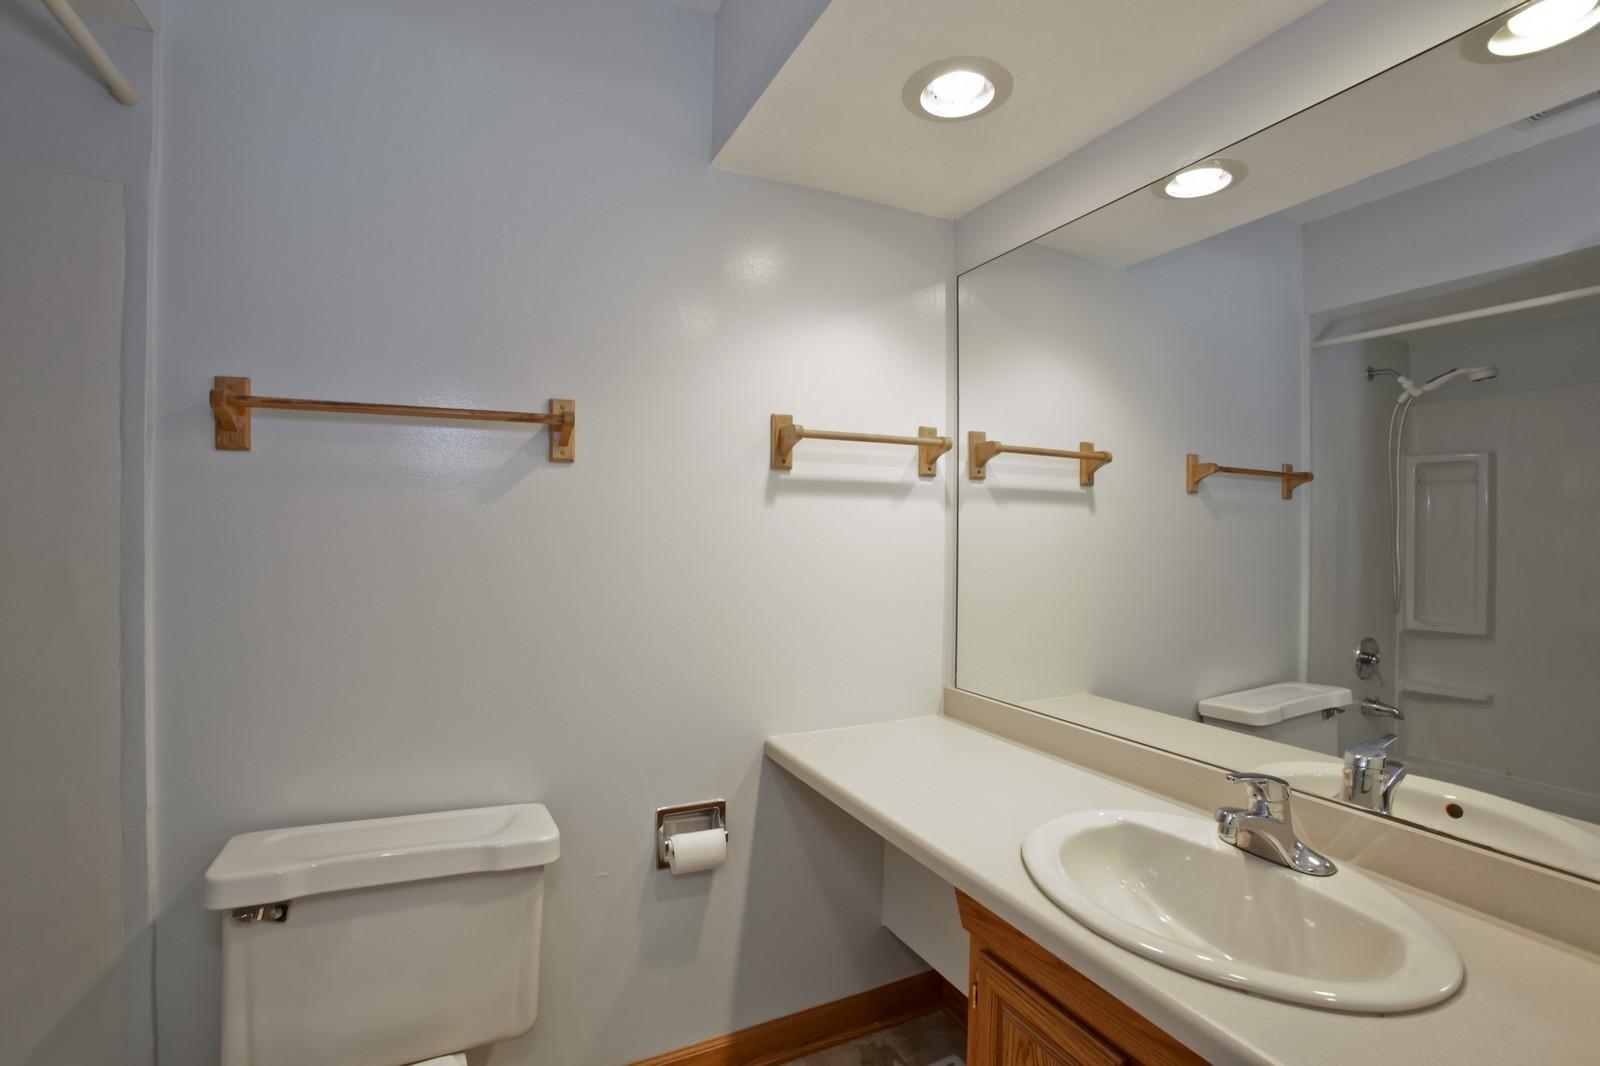 Real Estate Photography - 2811 Hobson Rd, Unit 3, Woodridge, IL, 60517 - Master Bathroom